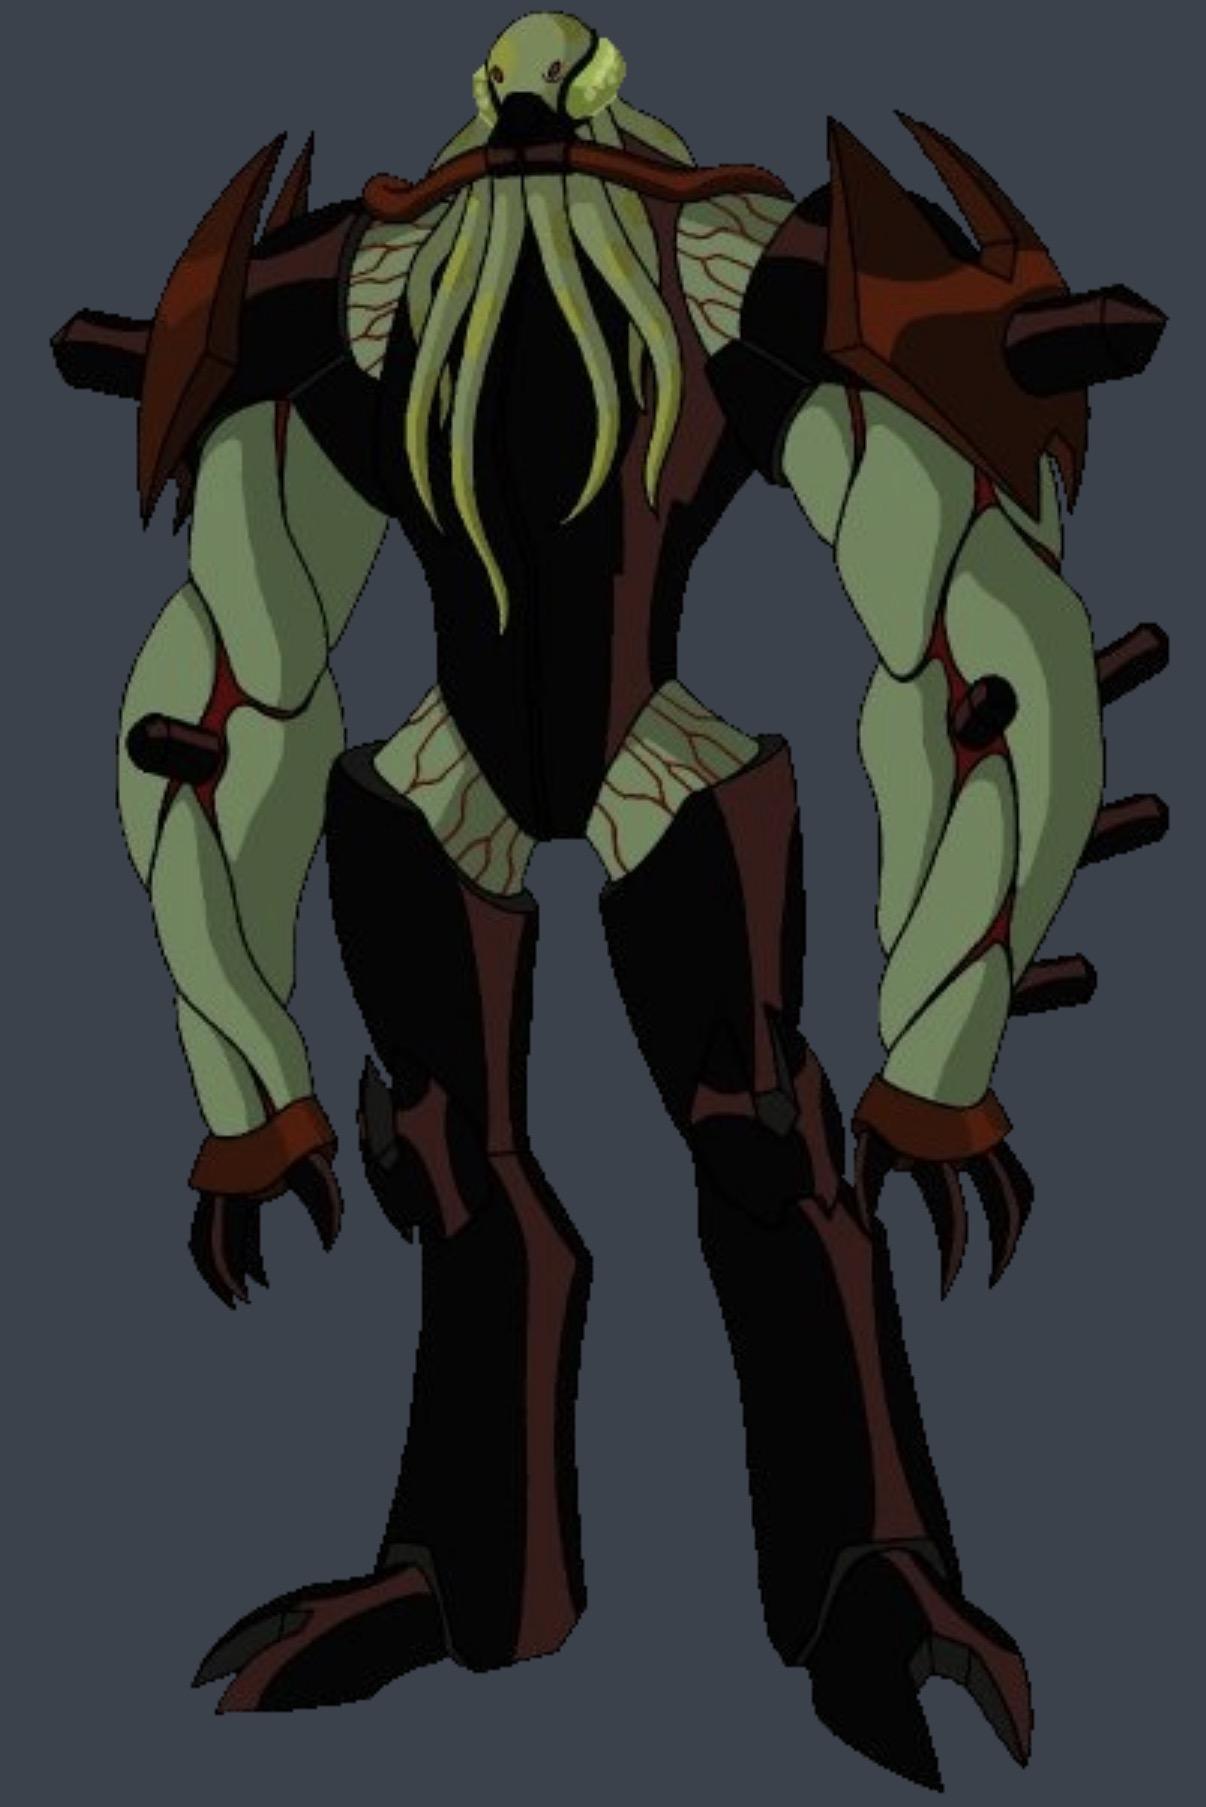 Vilgax | Warner Bros. Entertainment Wiki | FANDOM powered ... - photo#21